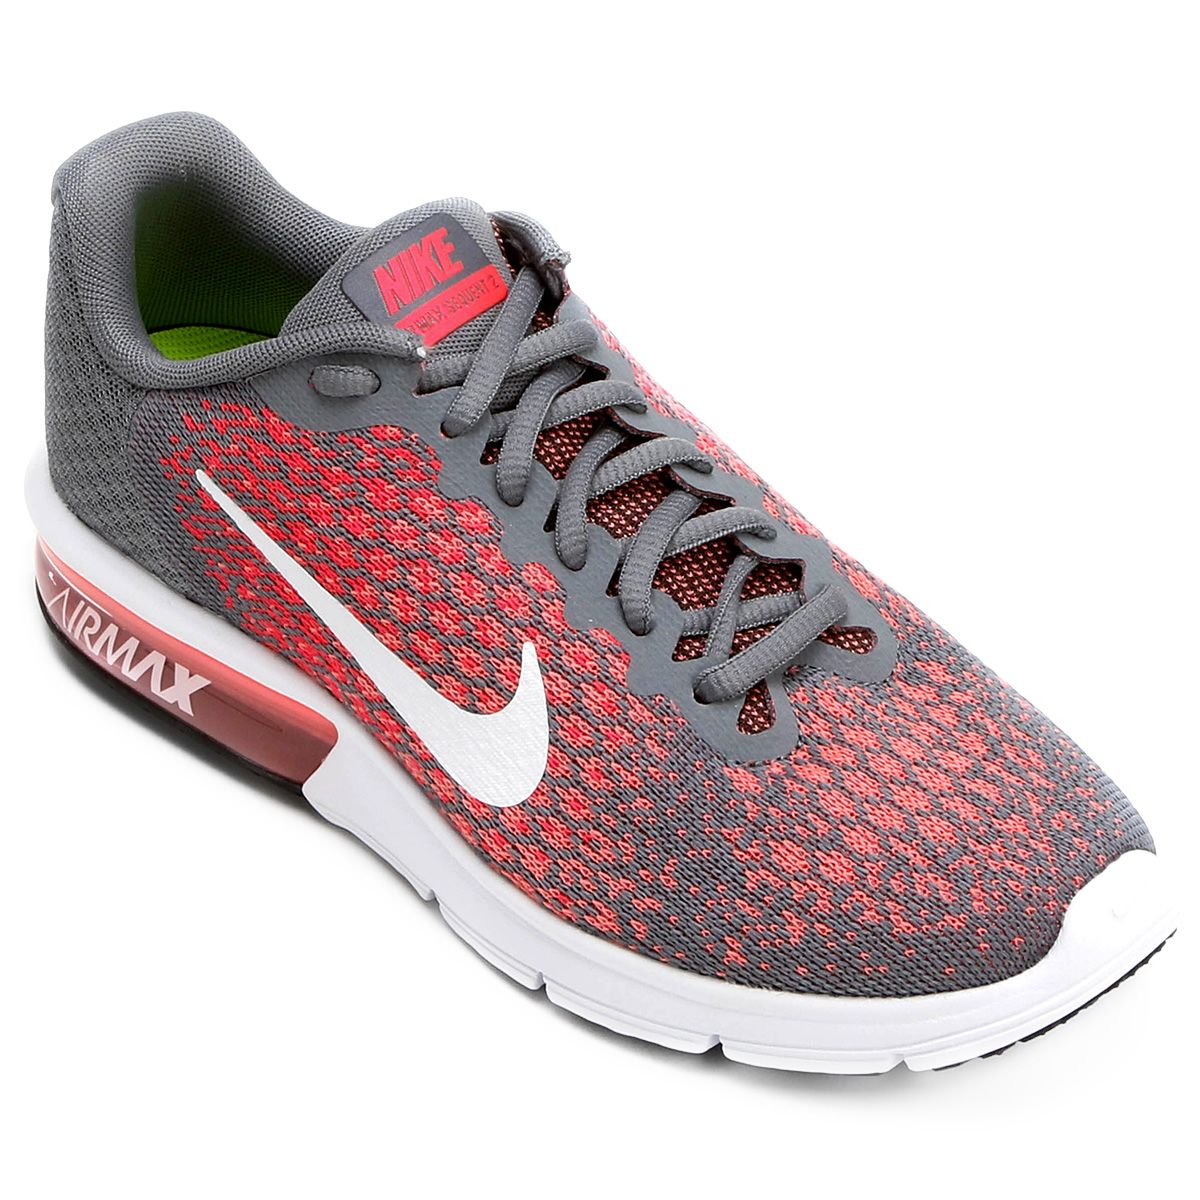 34d3db3c84 Tênis Nike Air Max Sequent 2 Feminino - Cinza e Vermelho